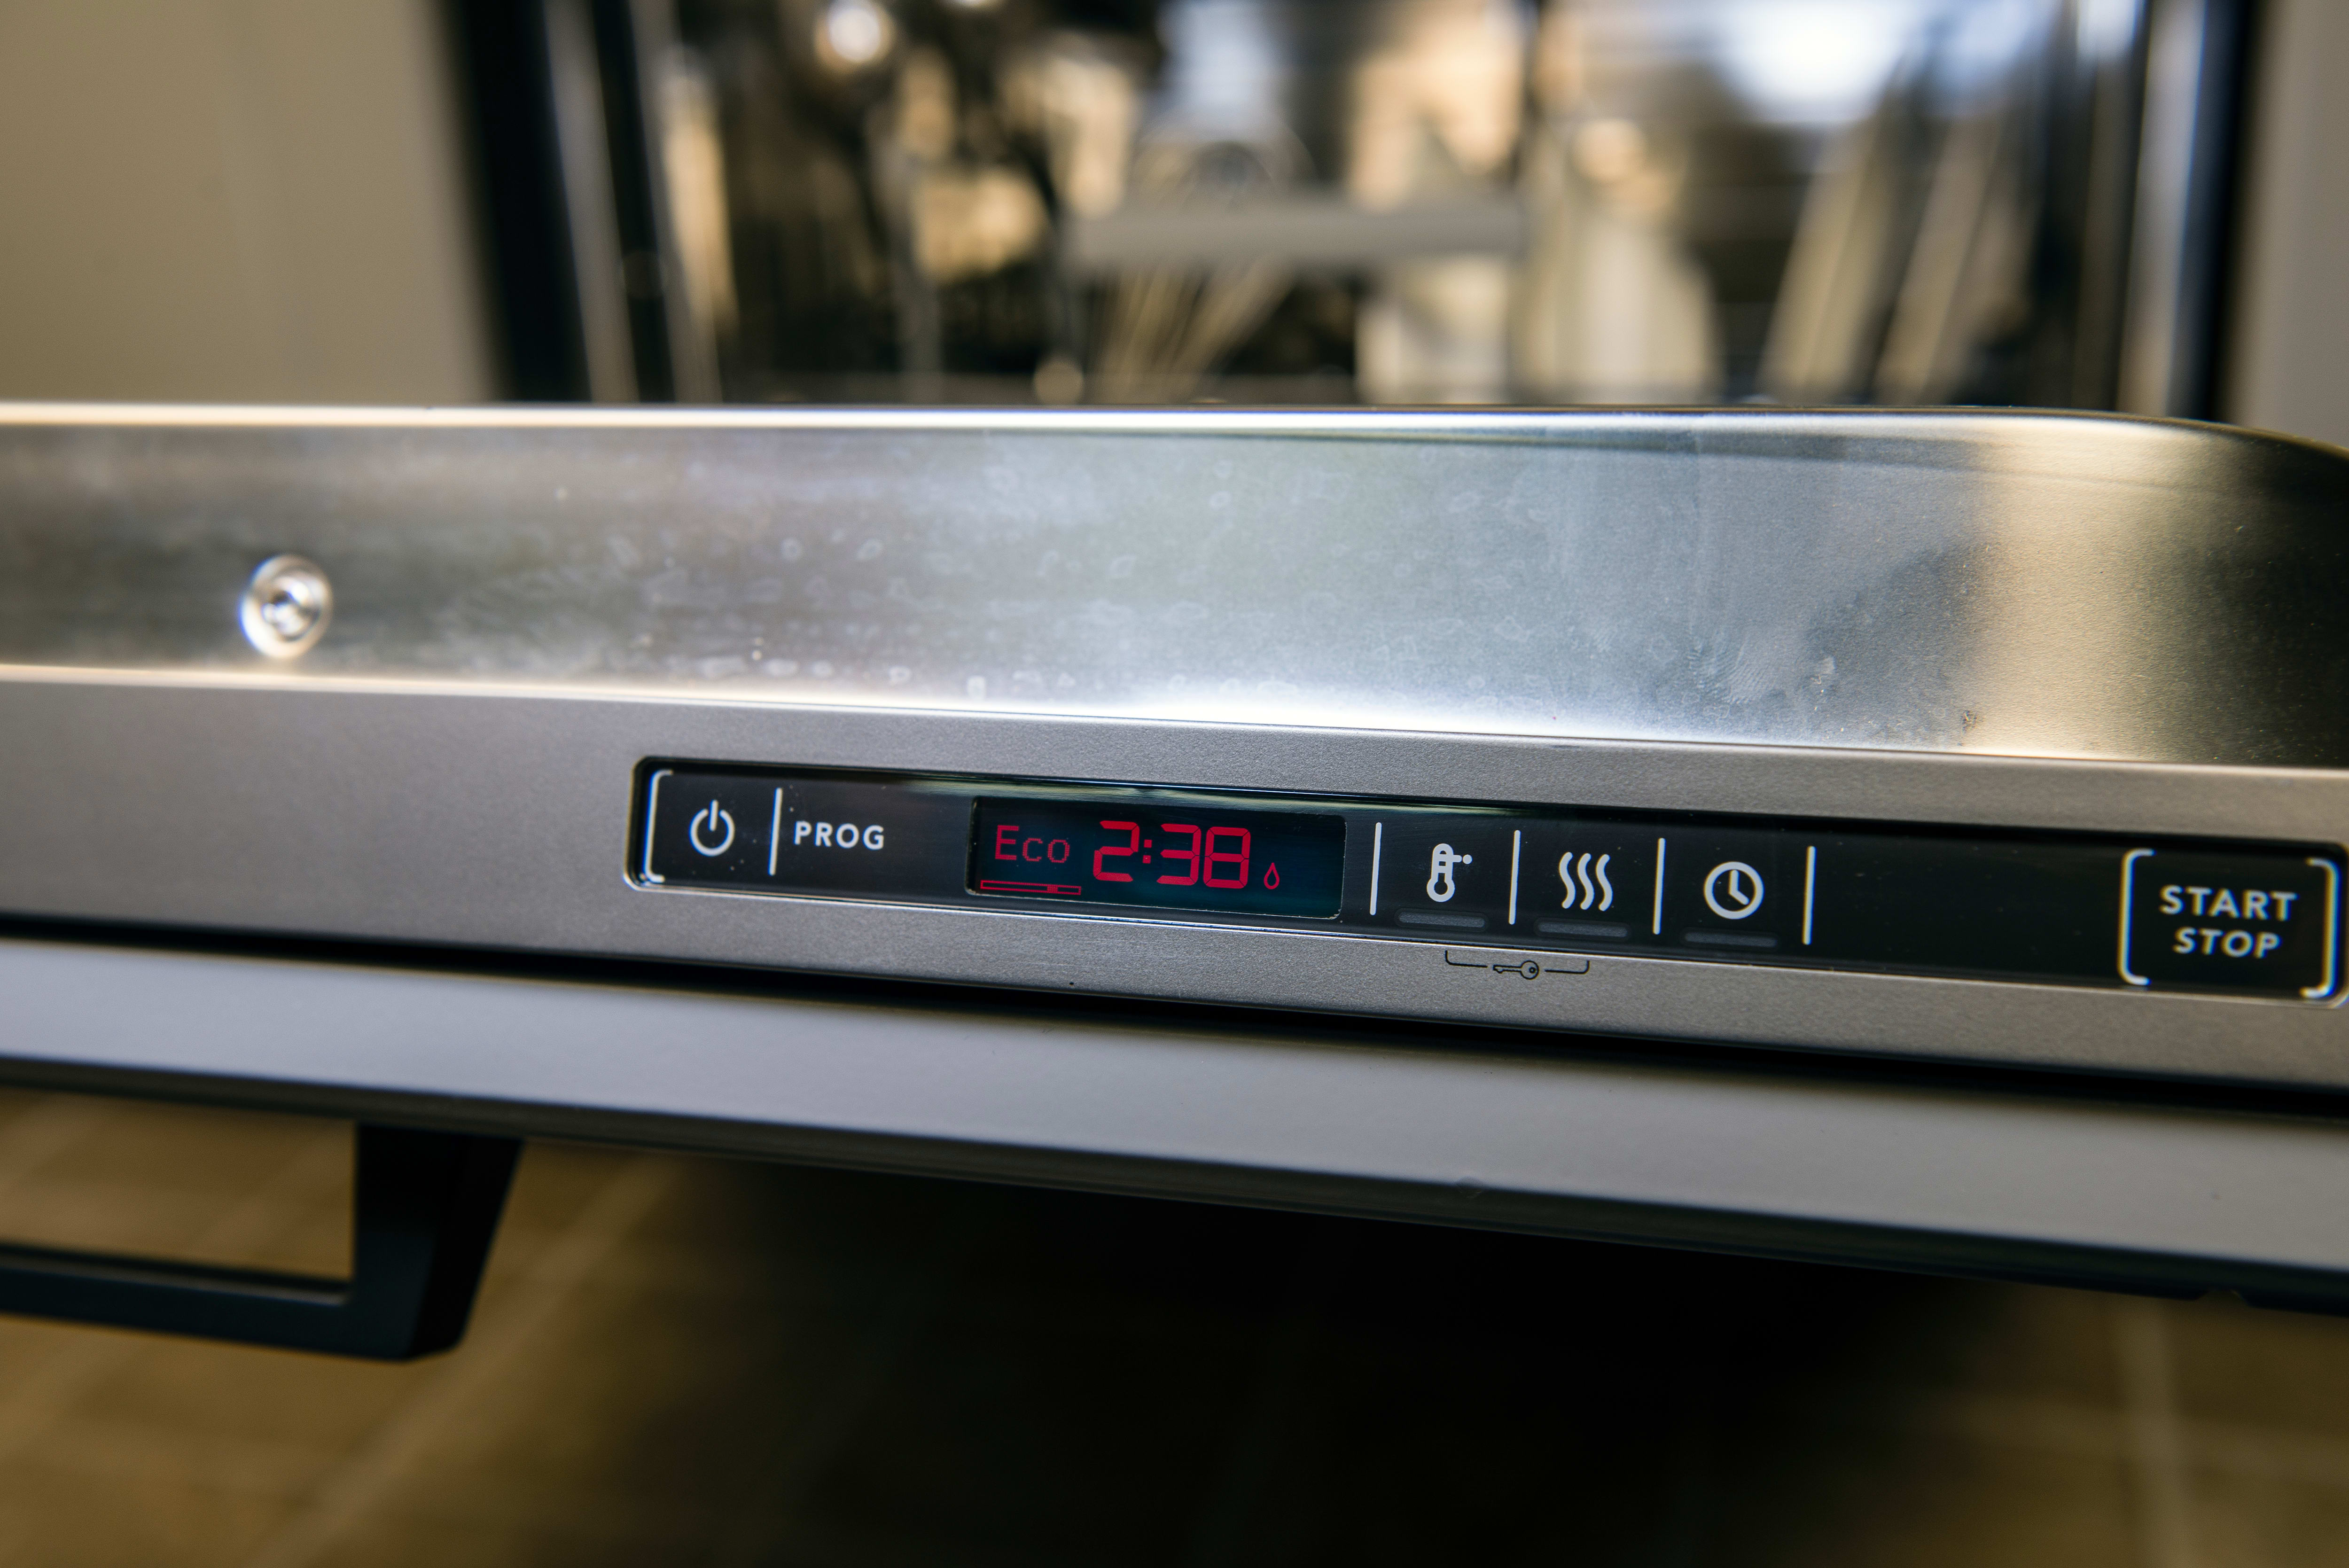 Asko D5534XXLFI control panel